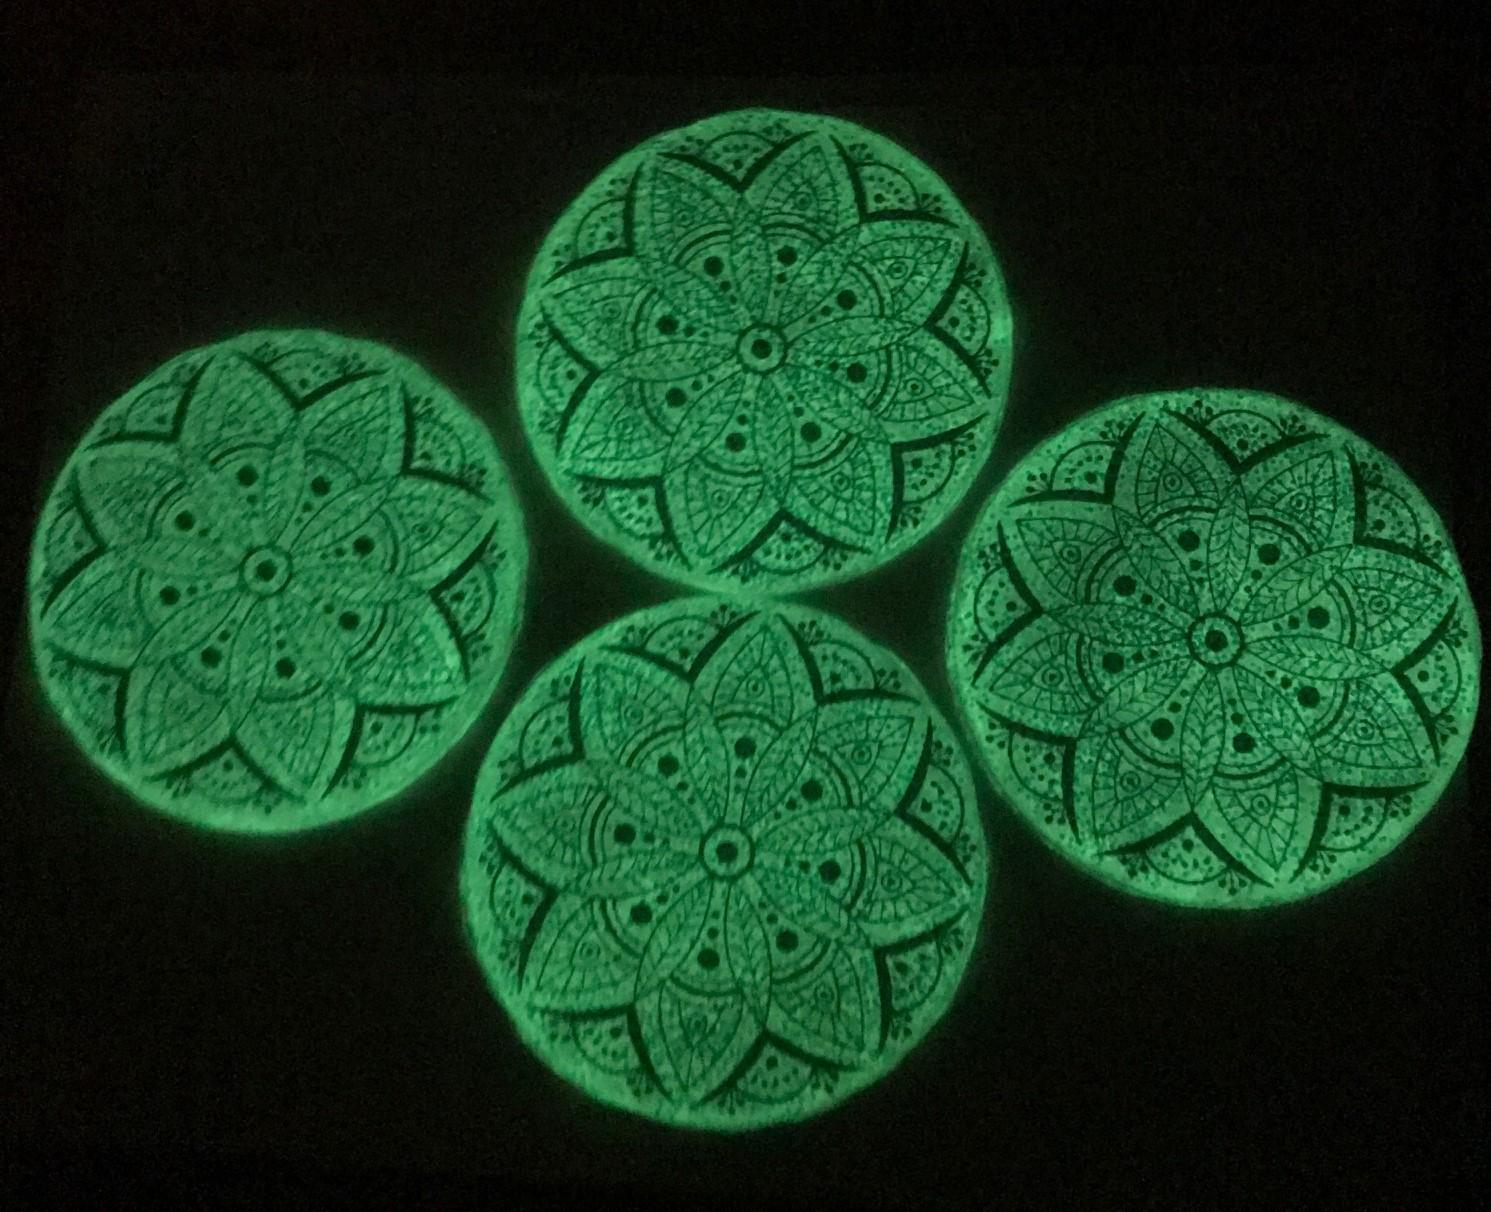 Green Glitter Coaster with Large Colorful Mandala